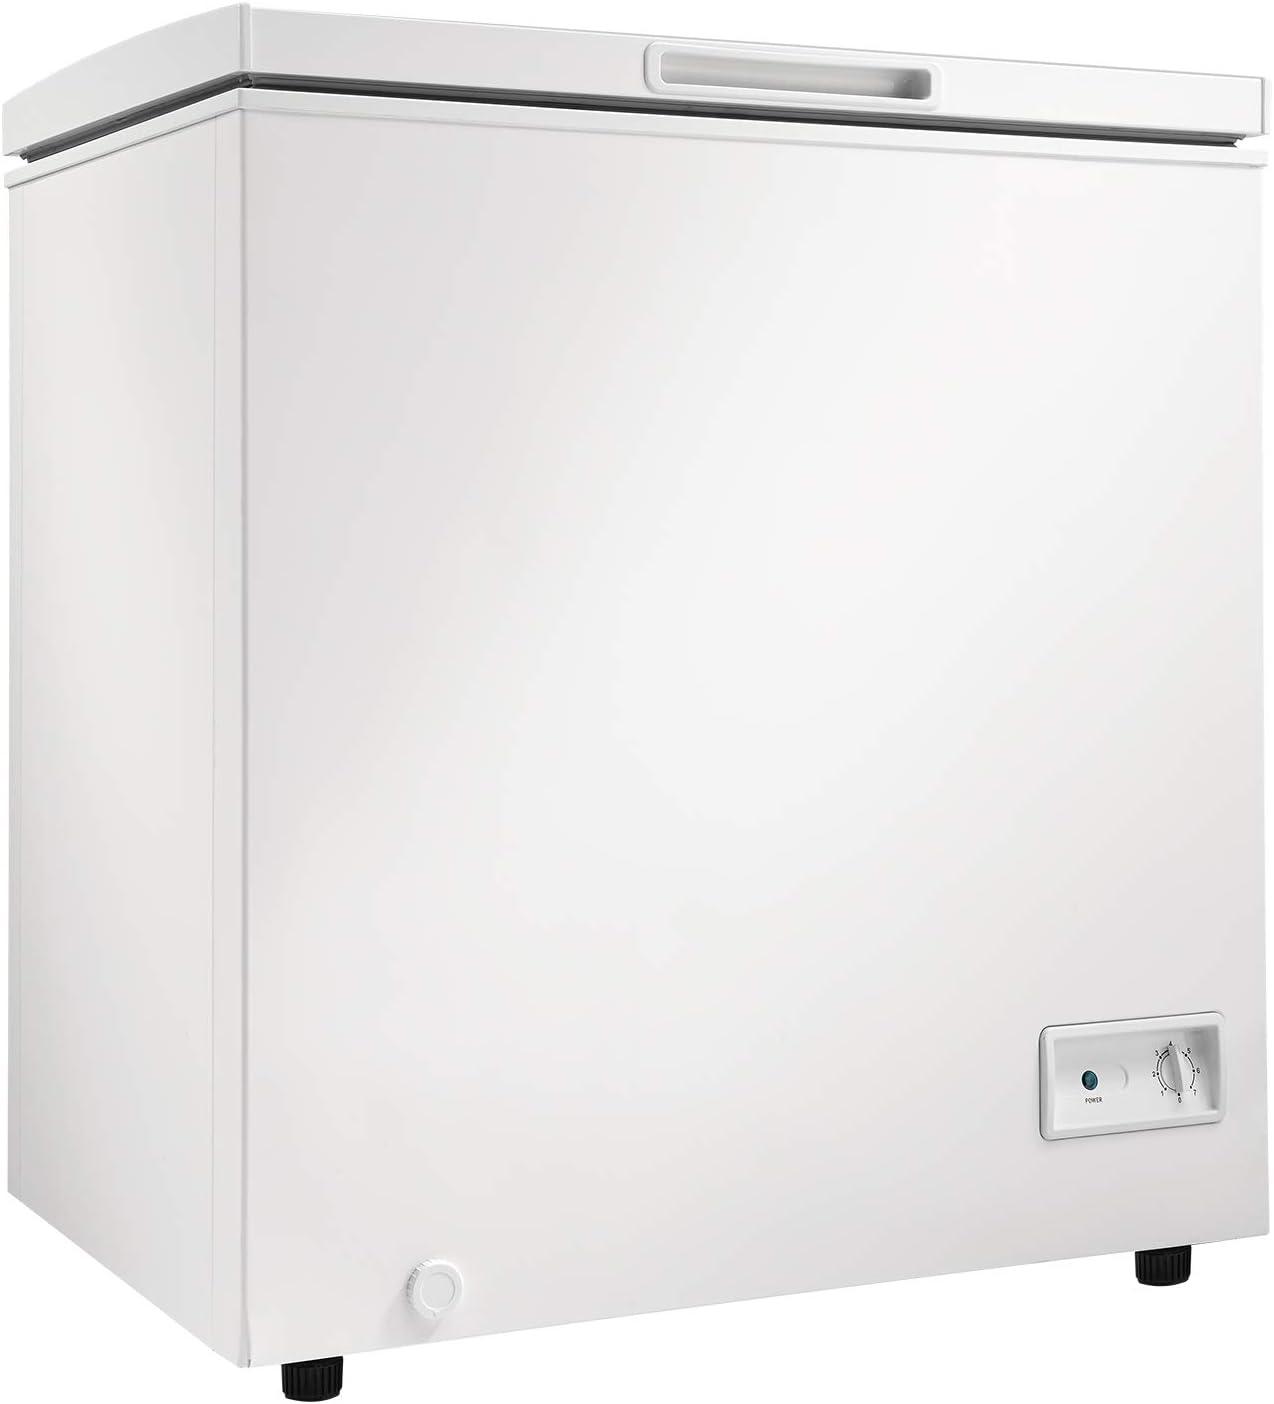 Danby DCF050B1WM Chest Freezer